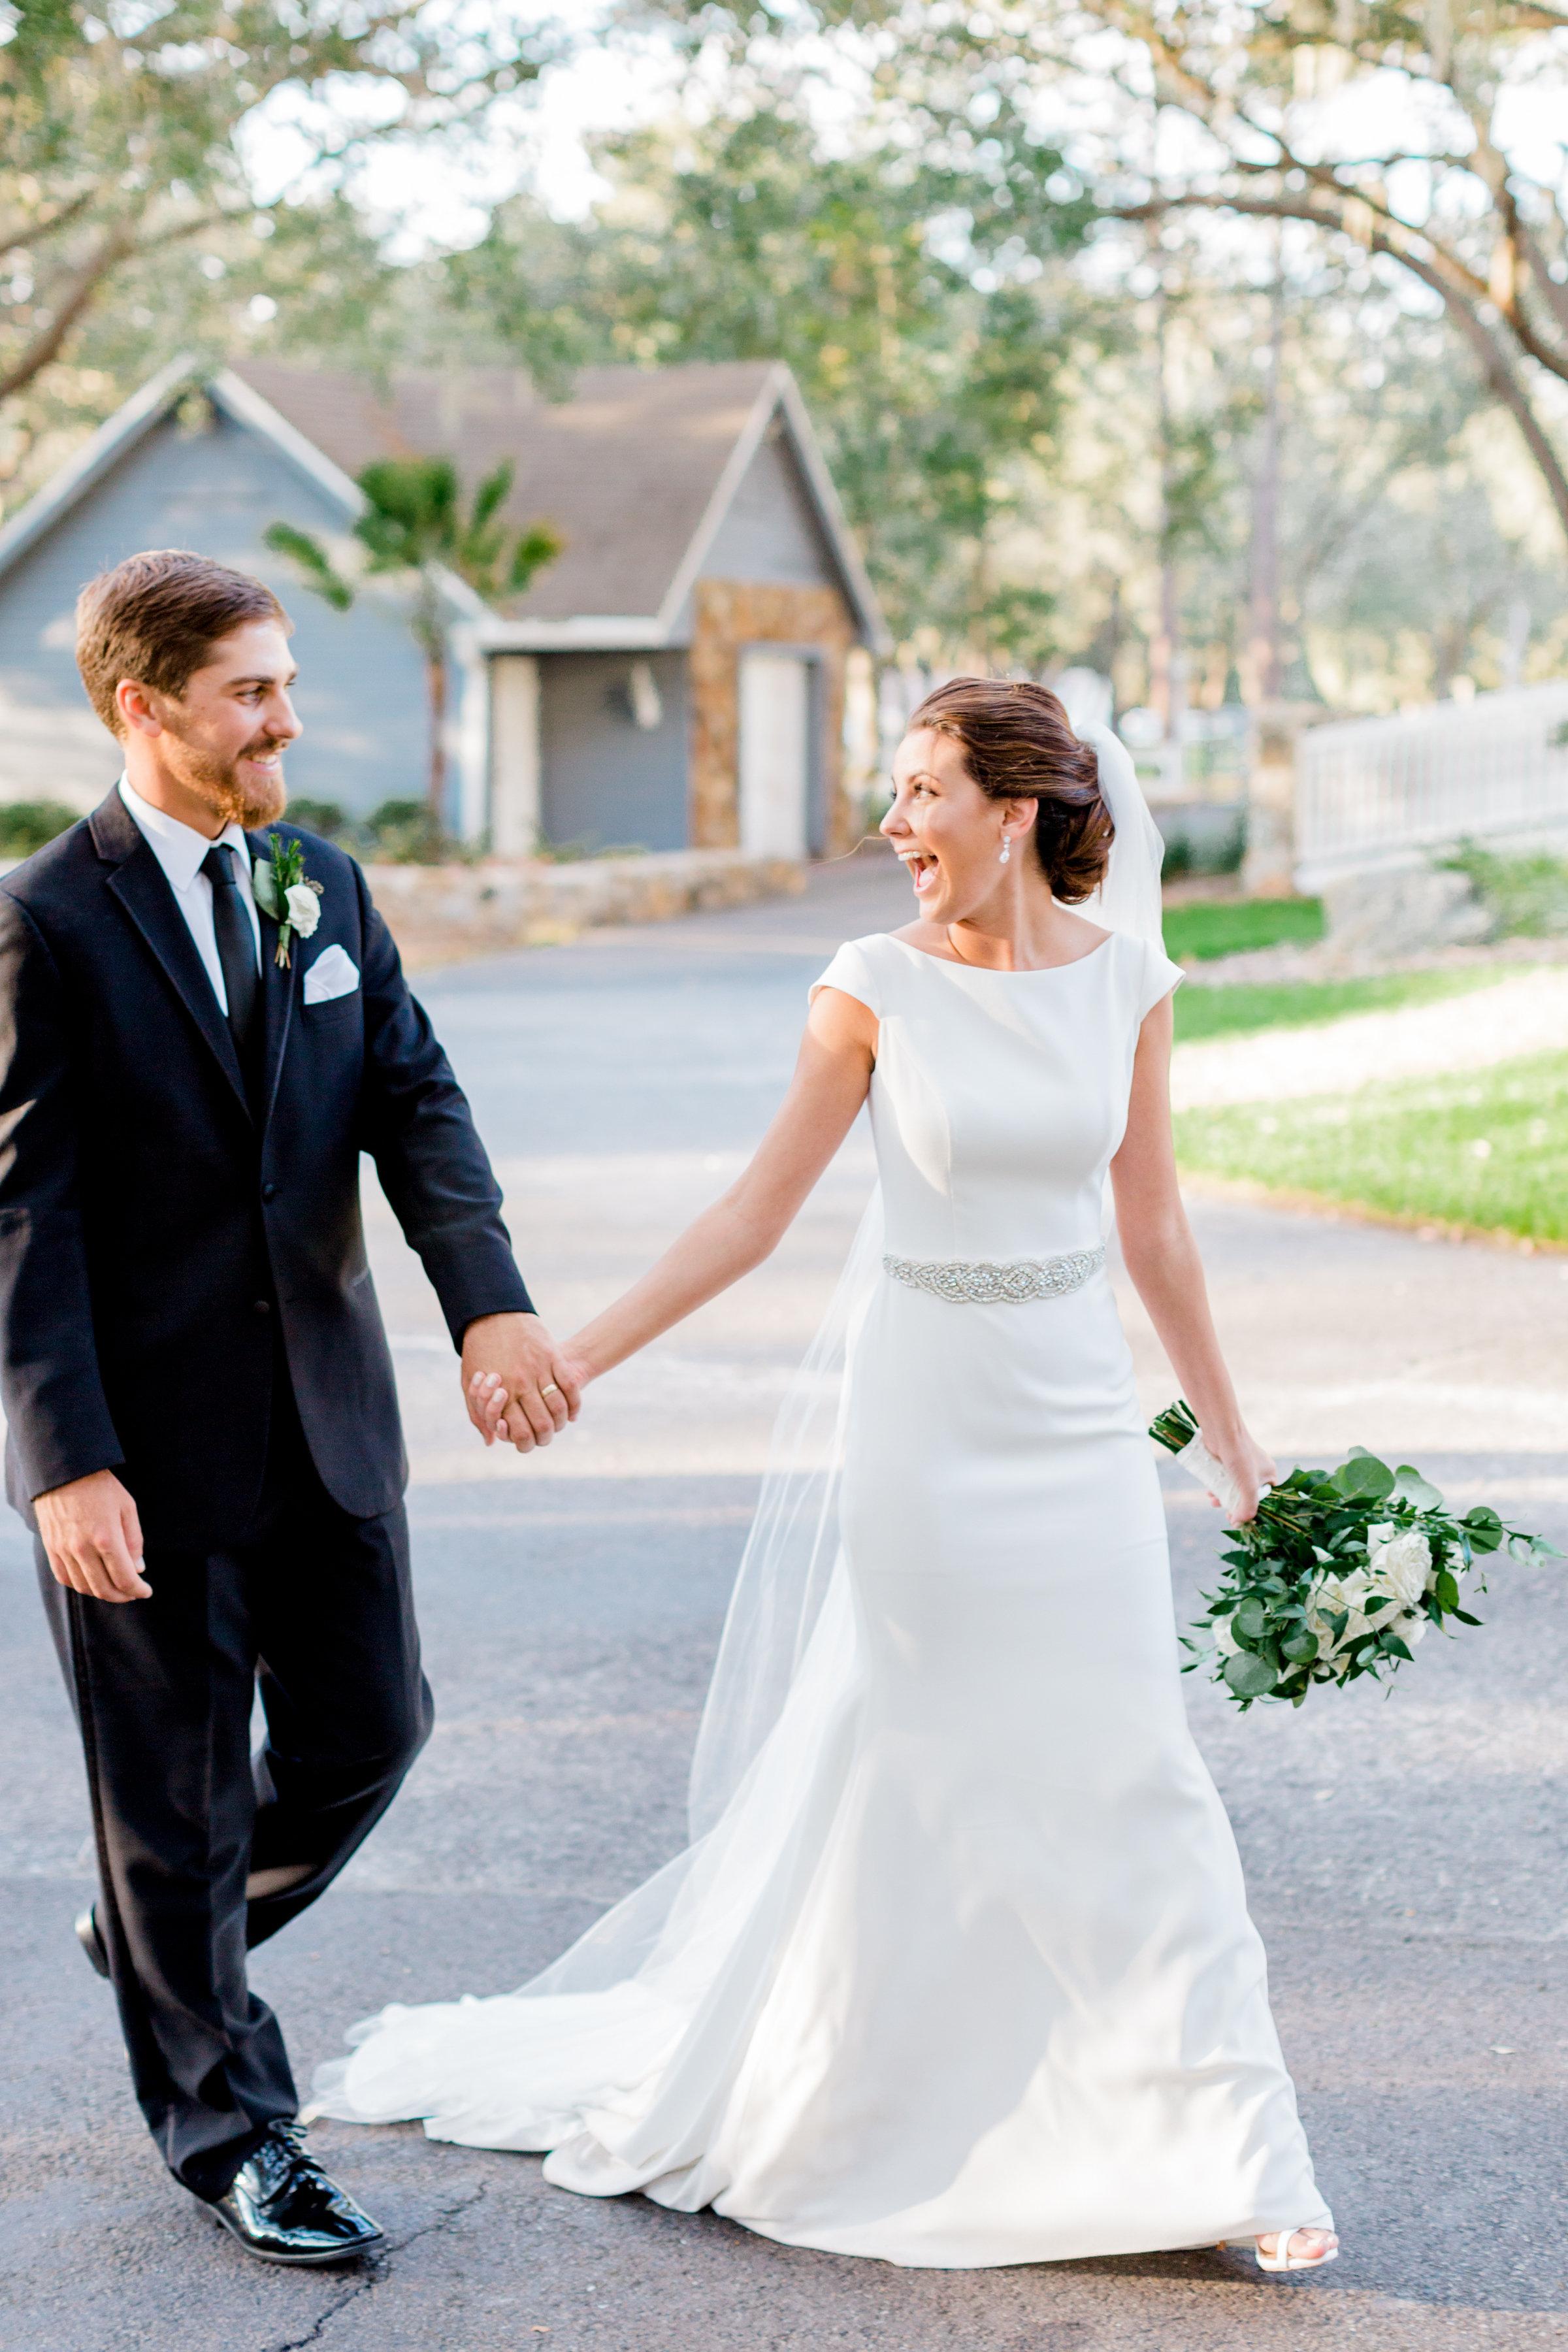 Monzy & Kenny's Wedding | Lauren Galloway Photography-521.jpg